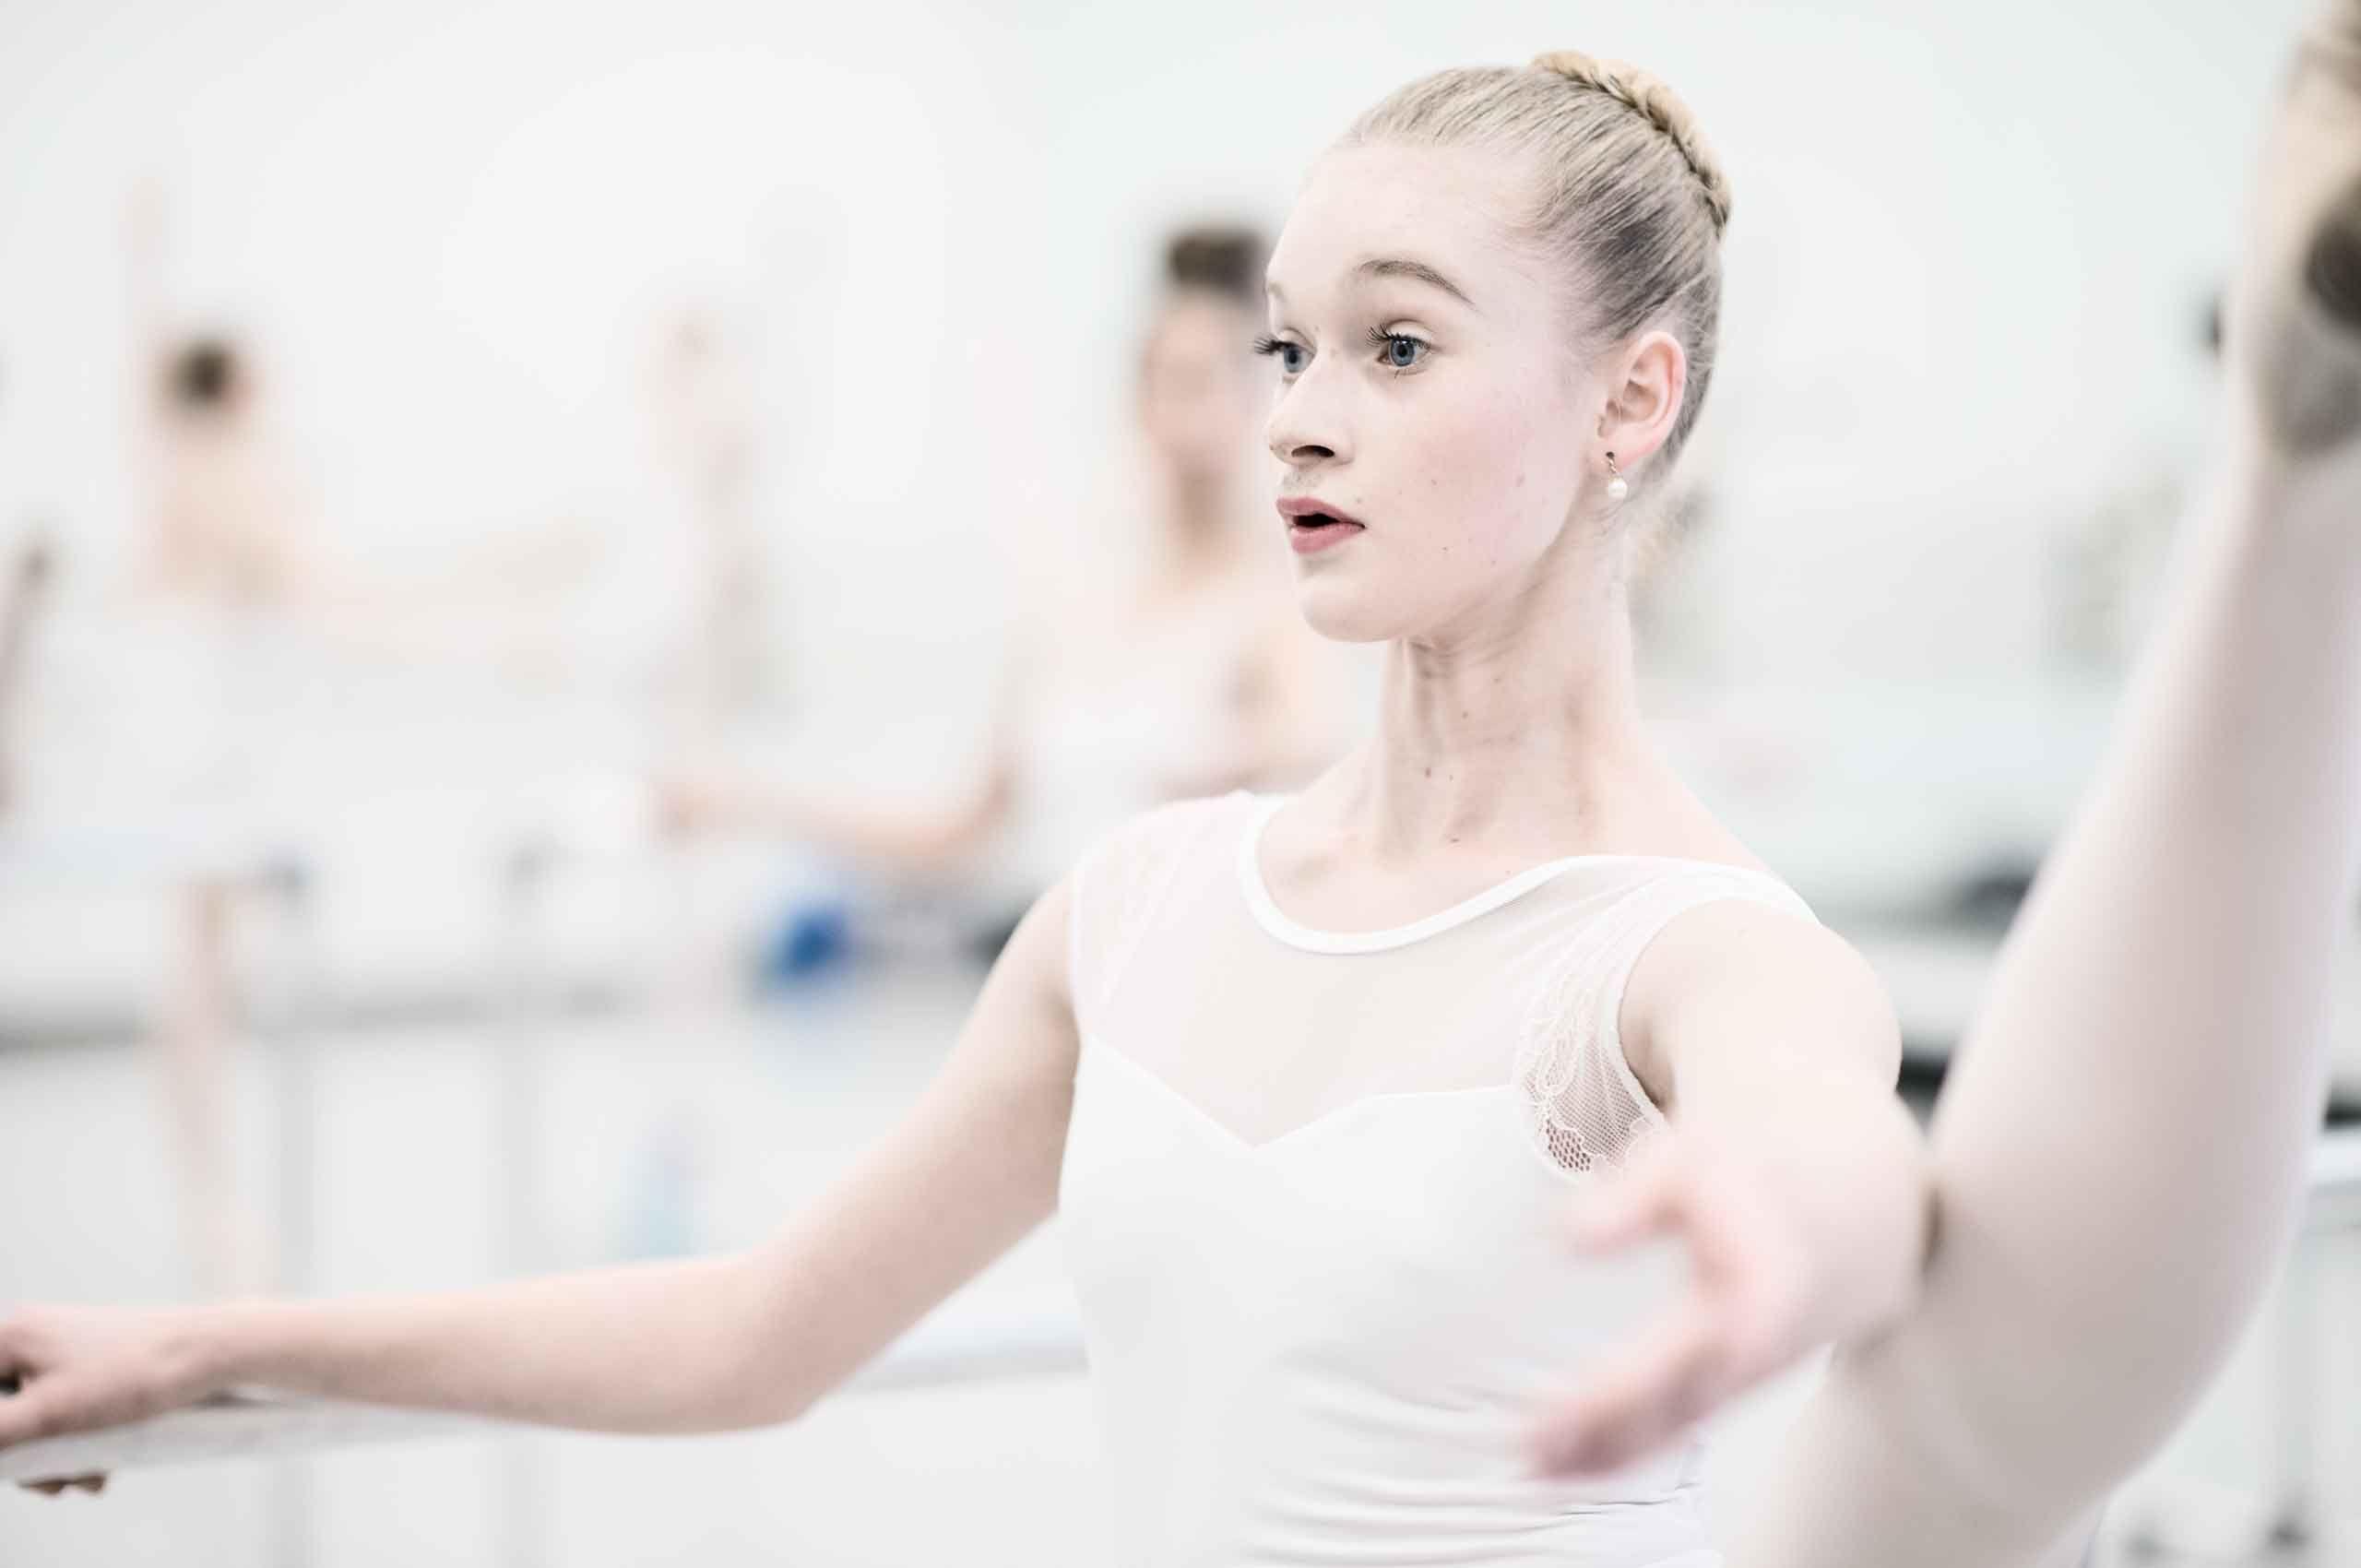 ballerina-practicing-legup-SavvanahLyle-by-HenrikOlundPhotography.jpg